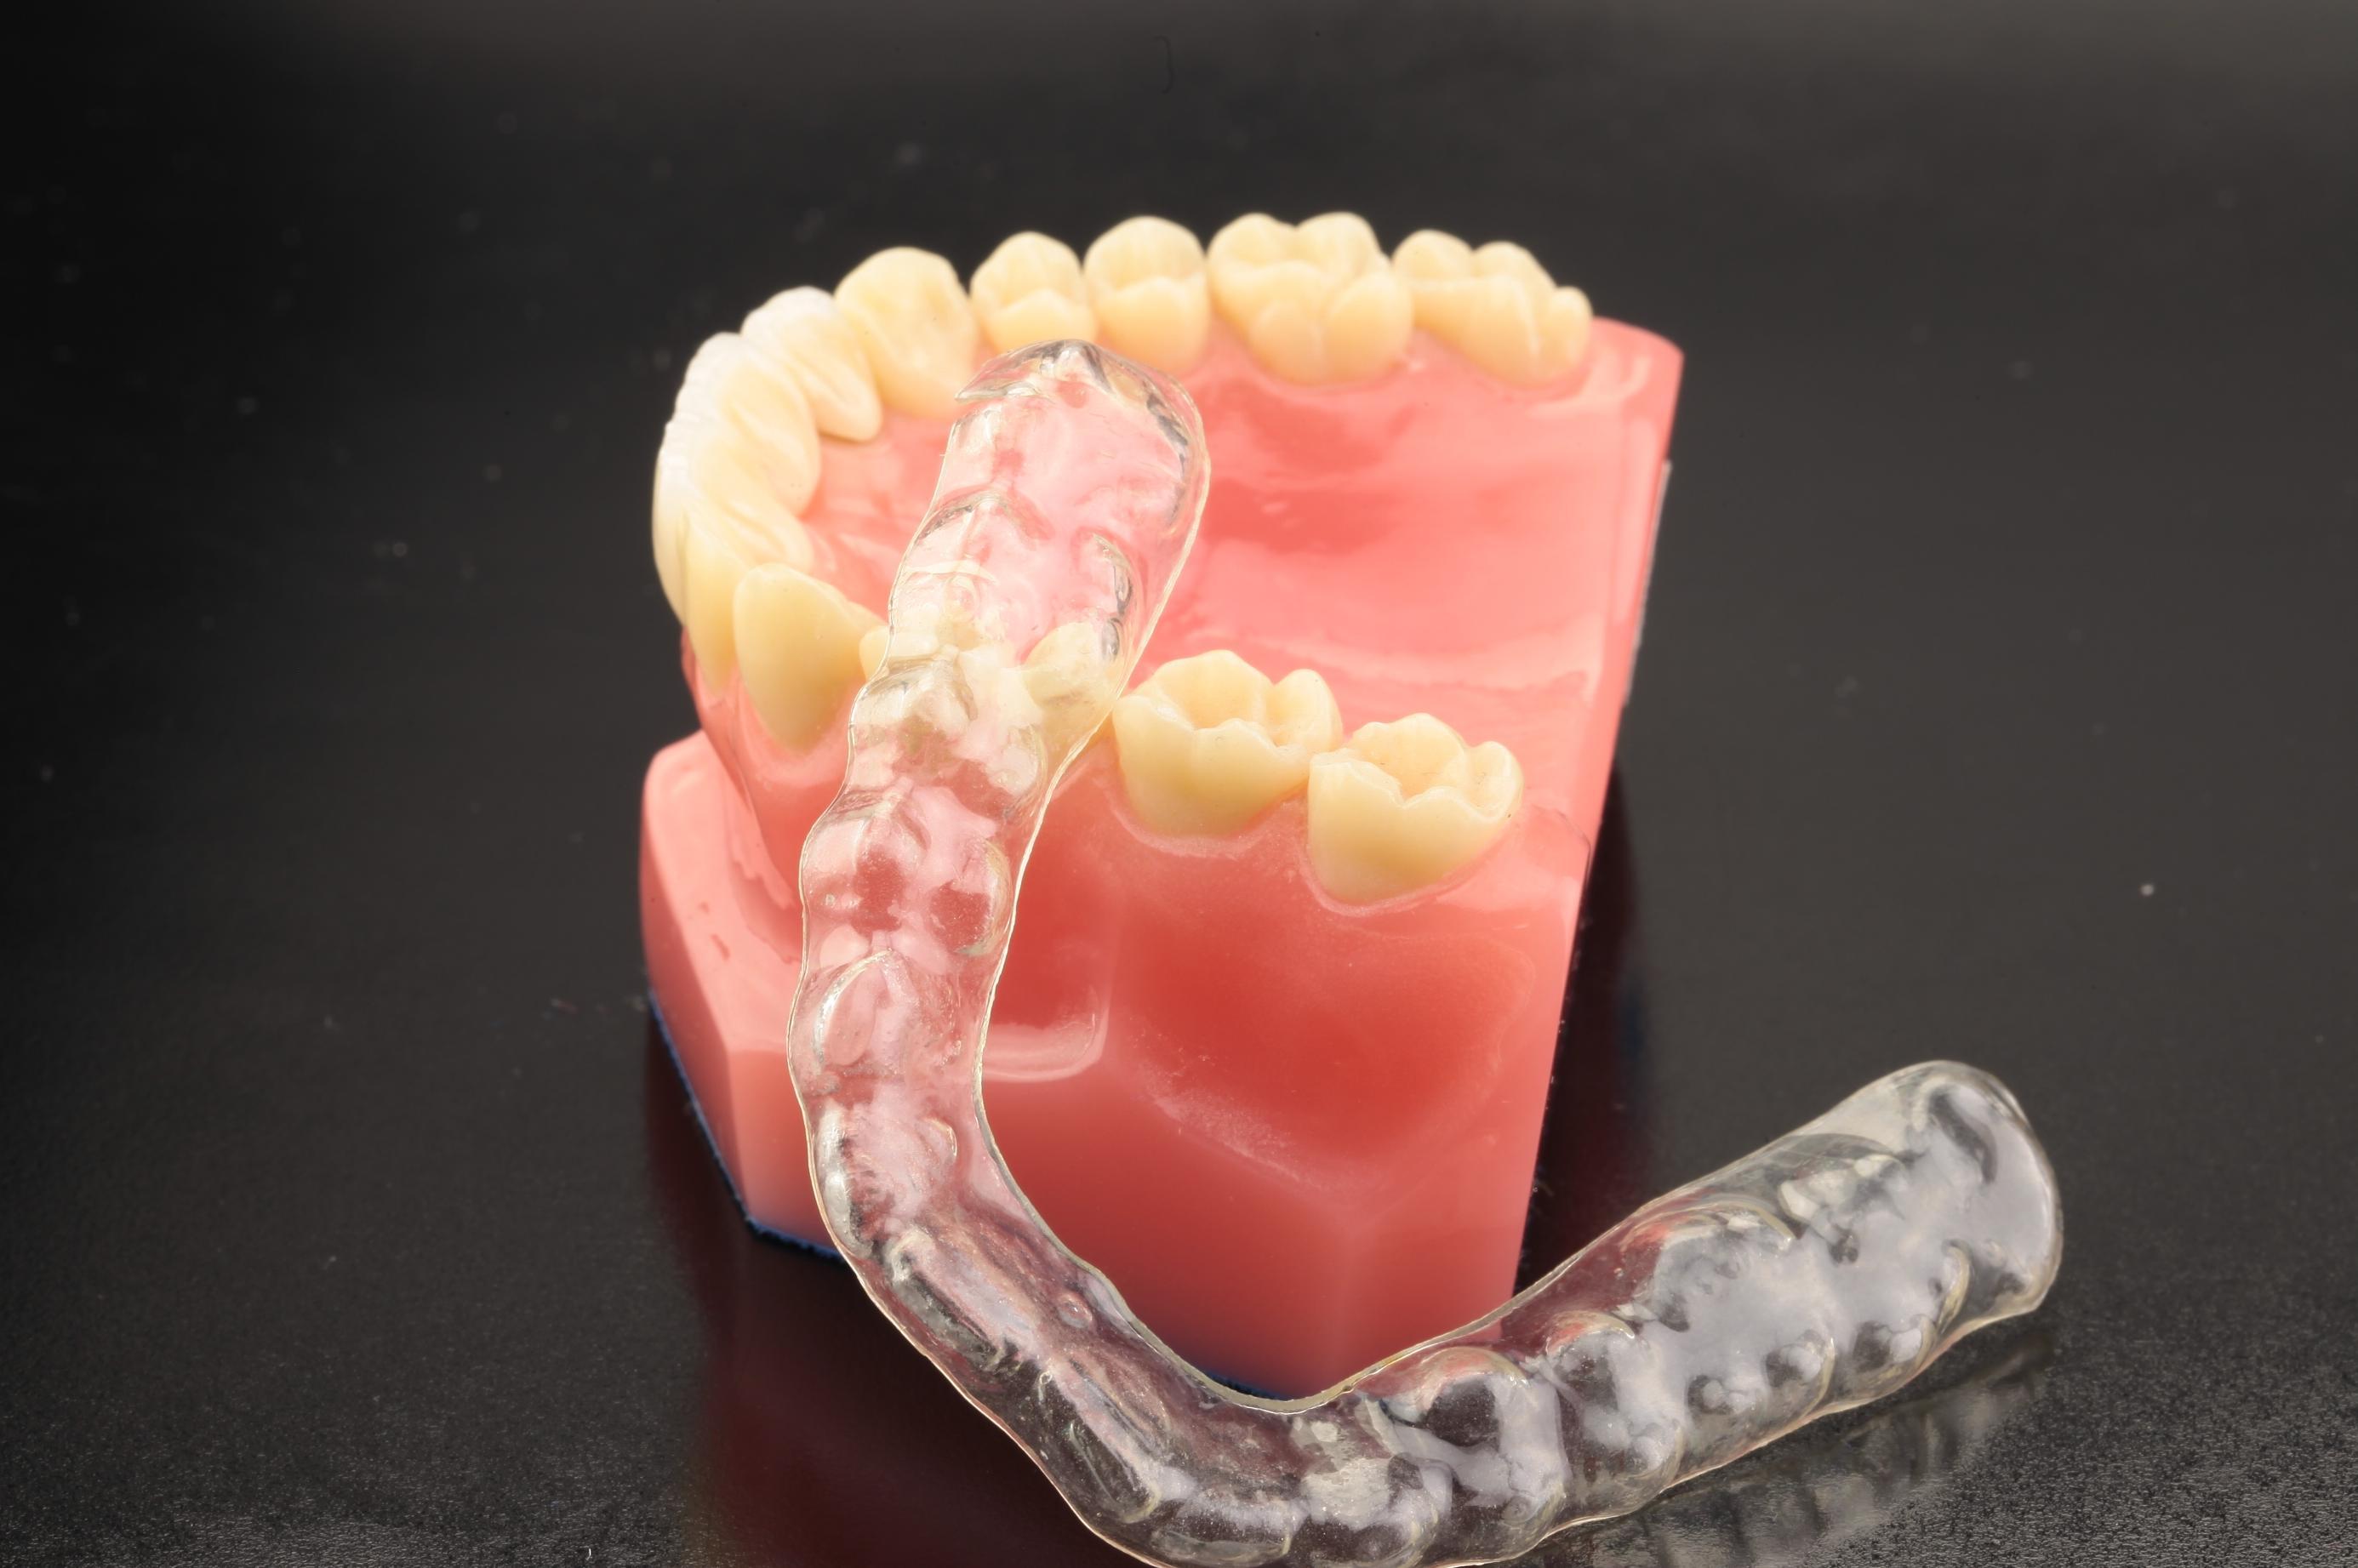 Foto 2 de Dentistas en Madrid | Clínica Dental Drs. Canga